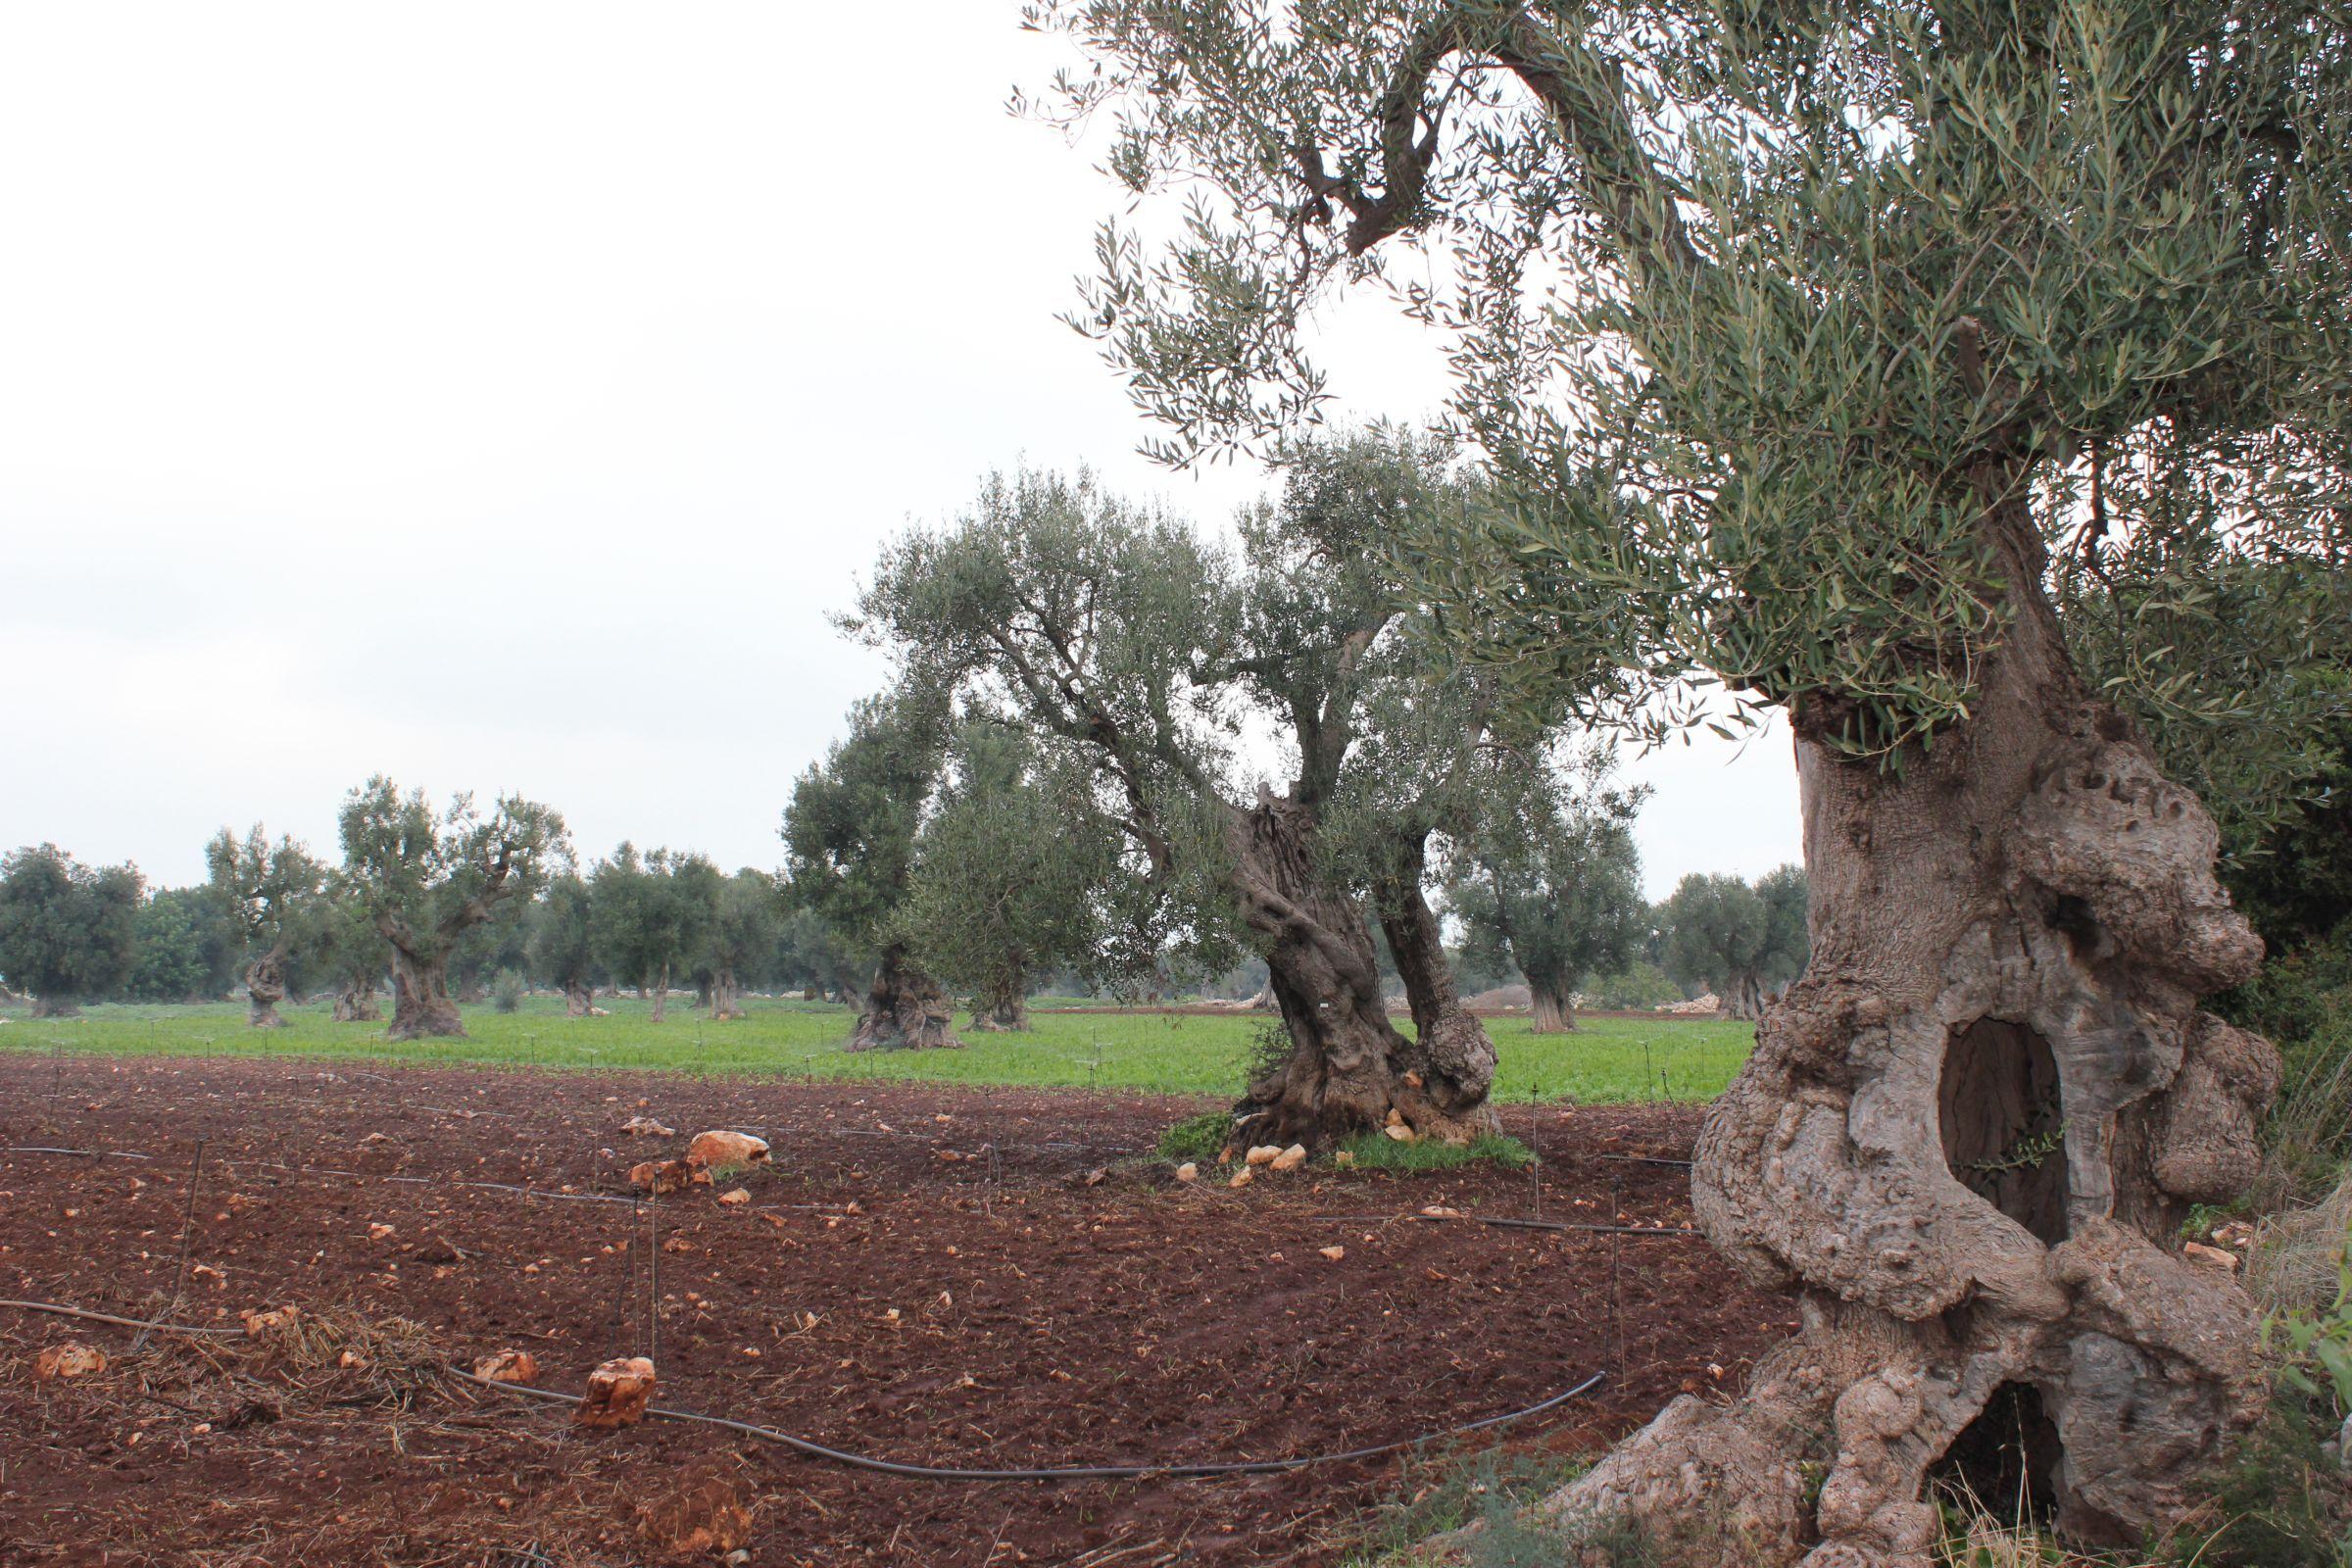 oliveto secolare - for sale - secular olive grove - puglia